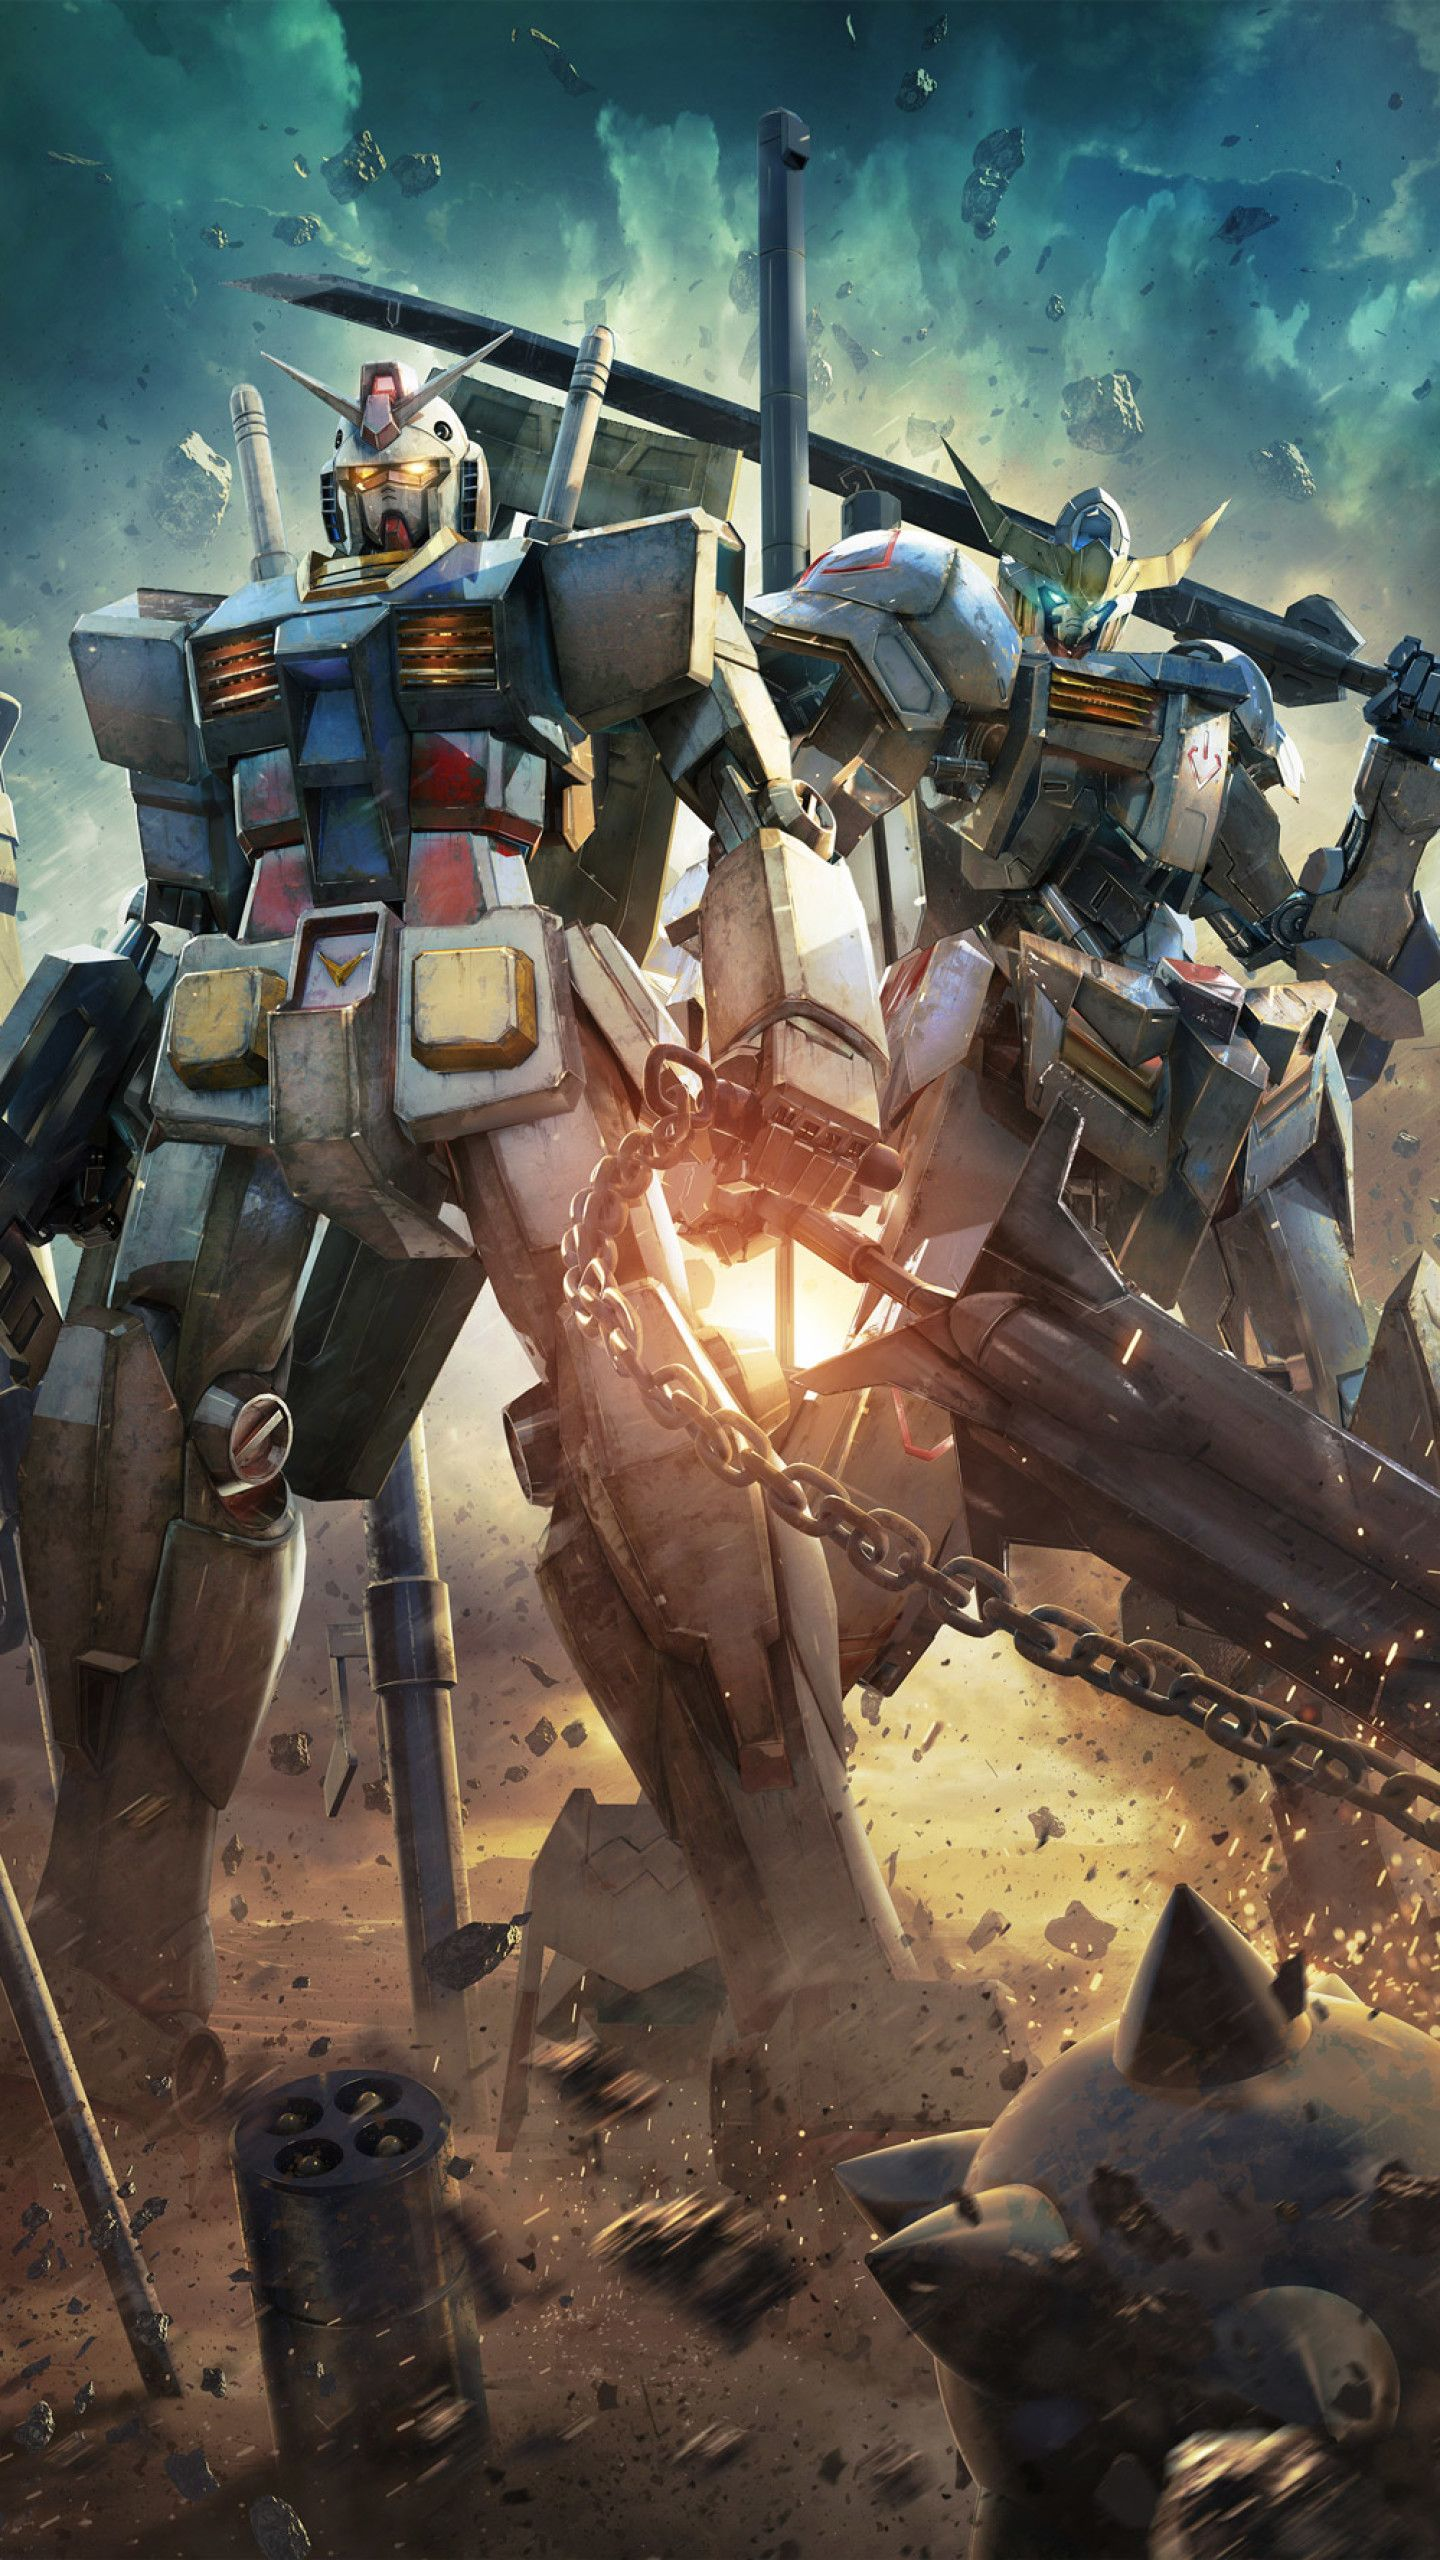 Gundam Wallpaper 1440x2560 ในปี 2020 (มีรูปภาพ) หุ่นยนต์